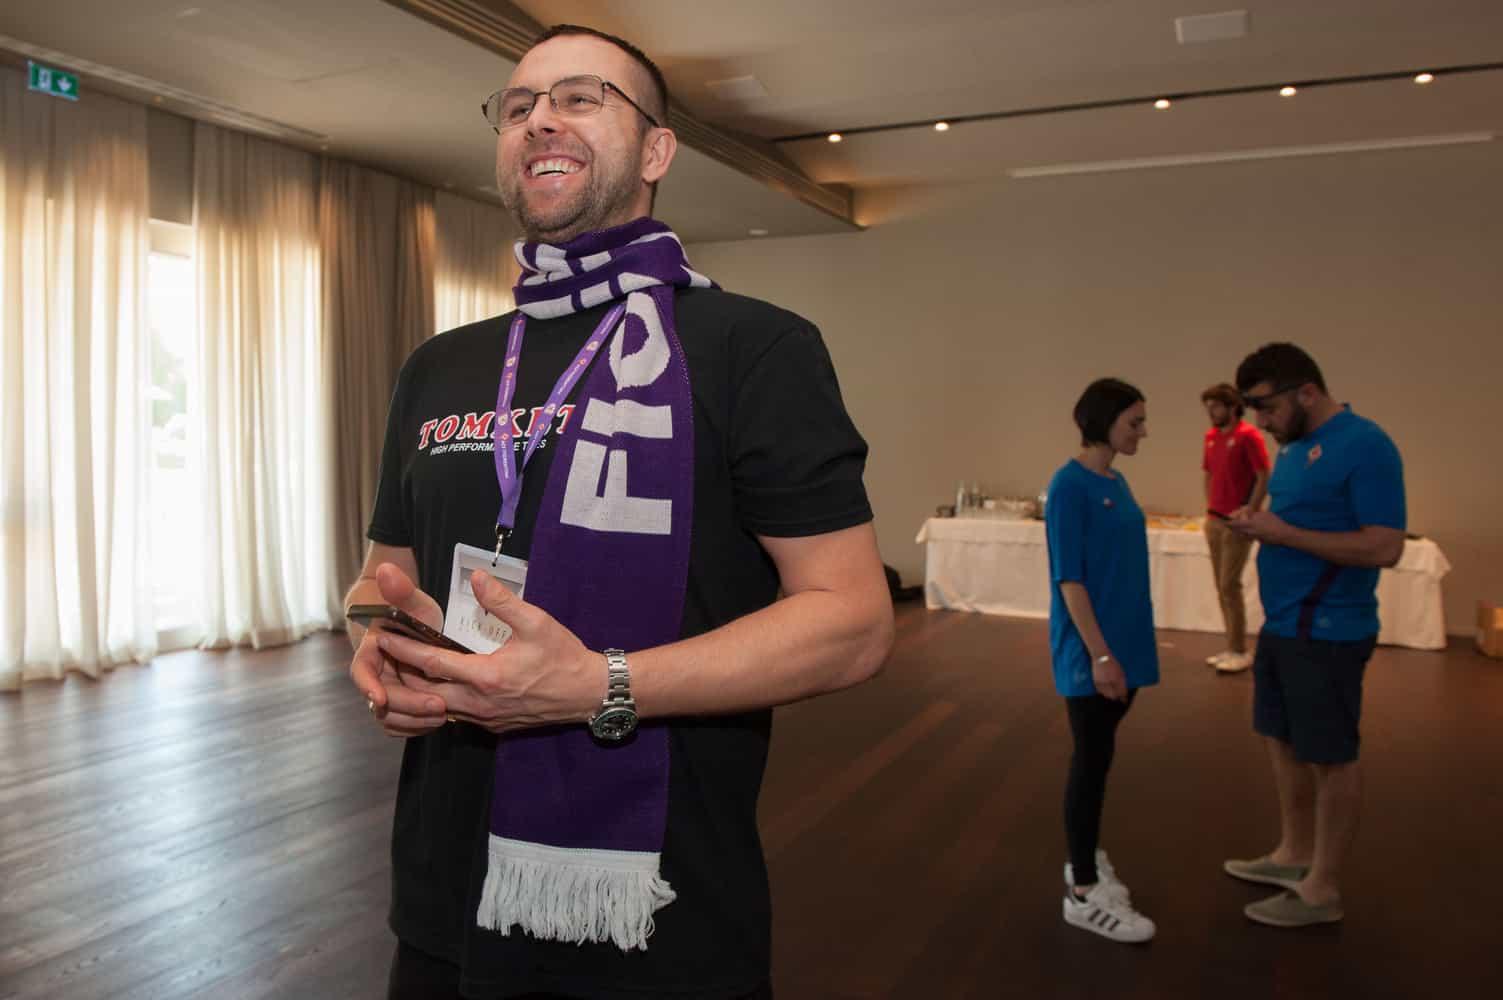 Radek Grill at ACF Fiorentina